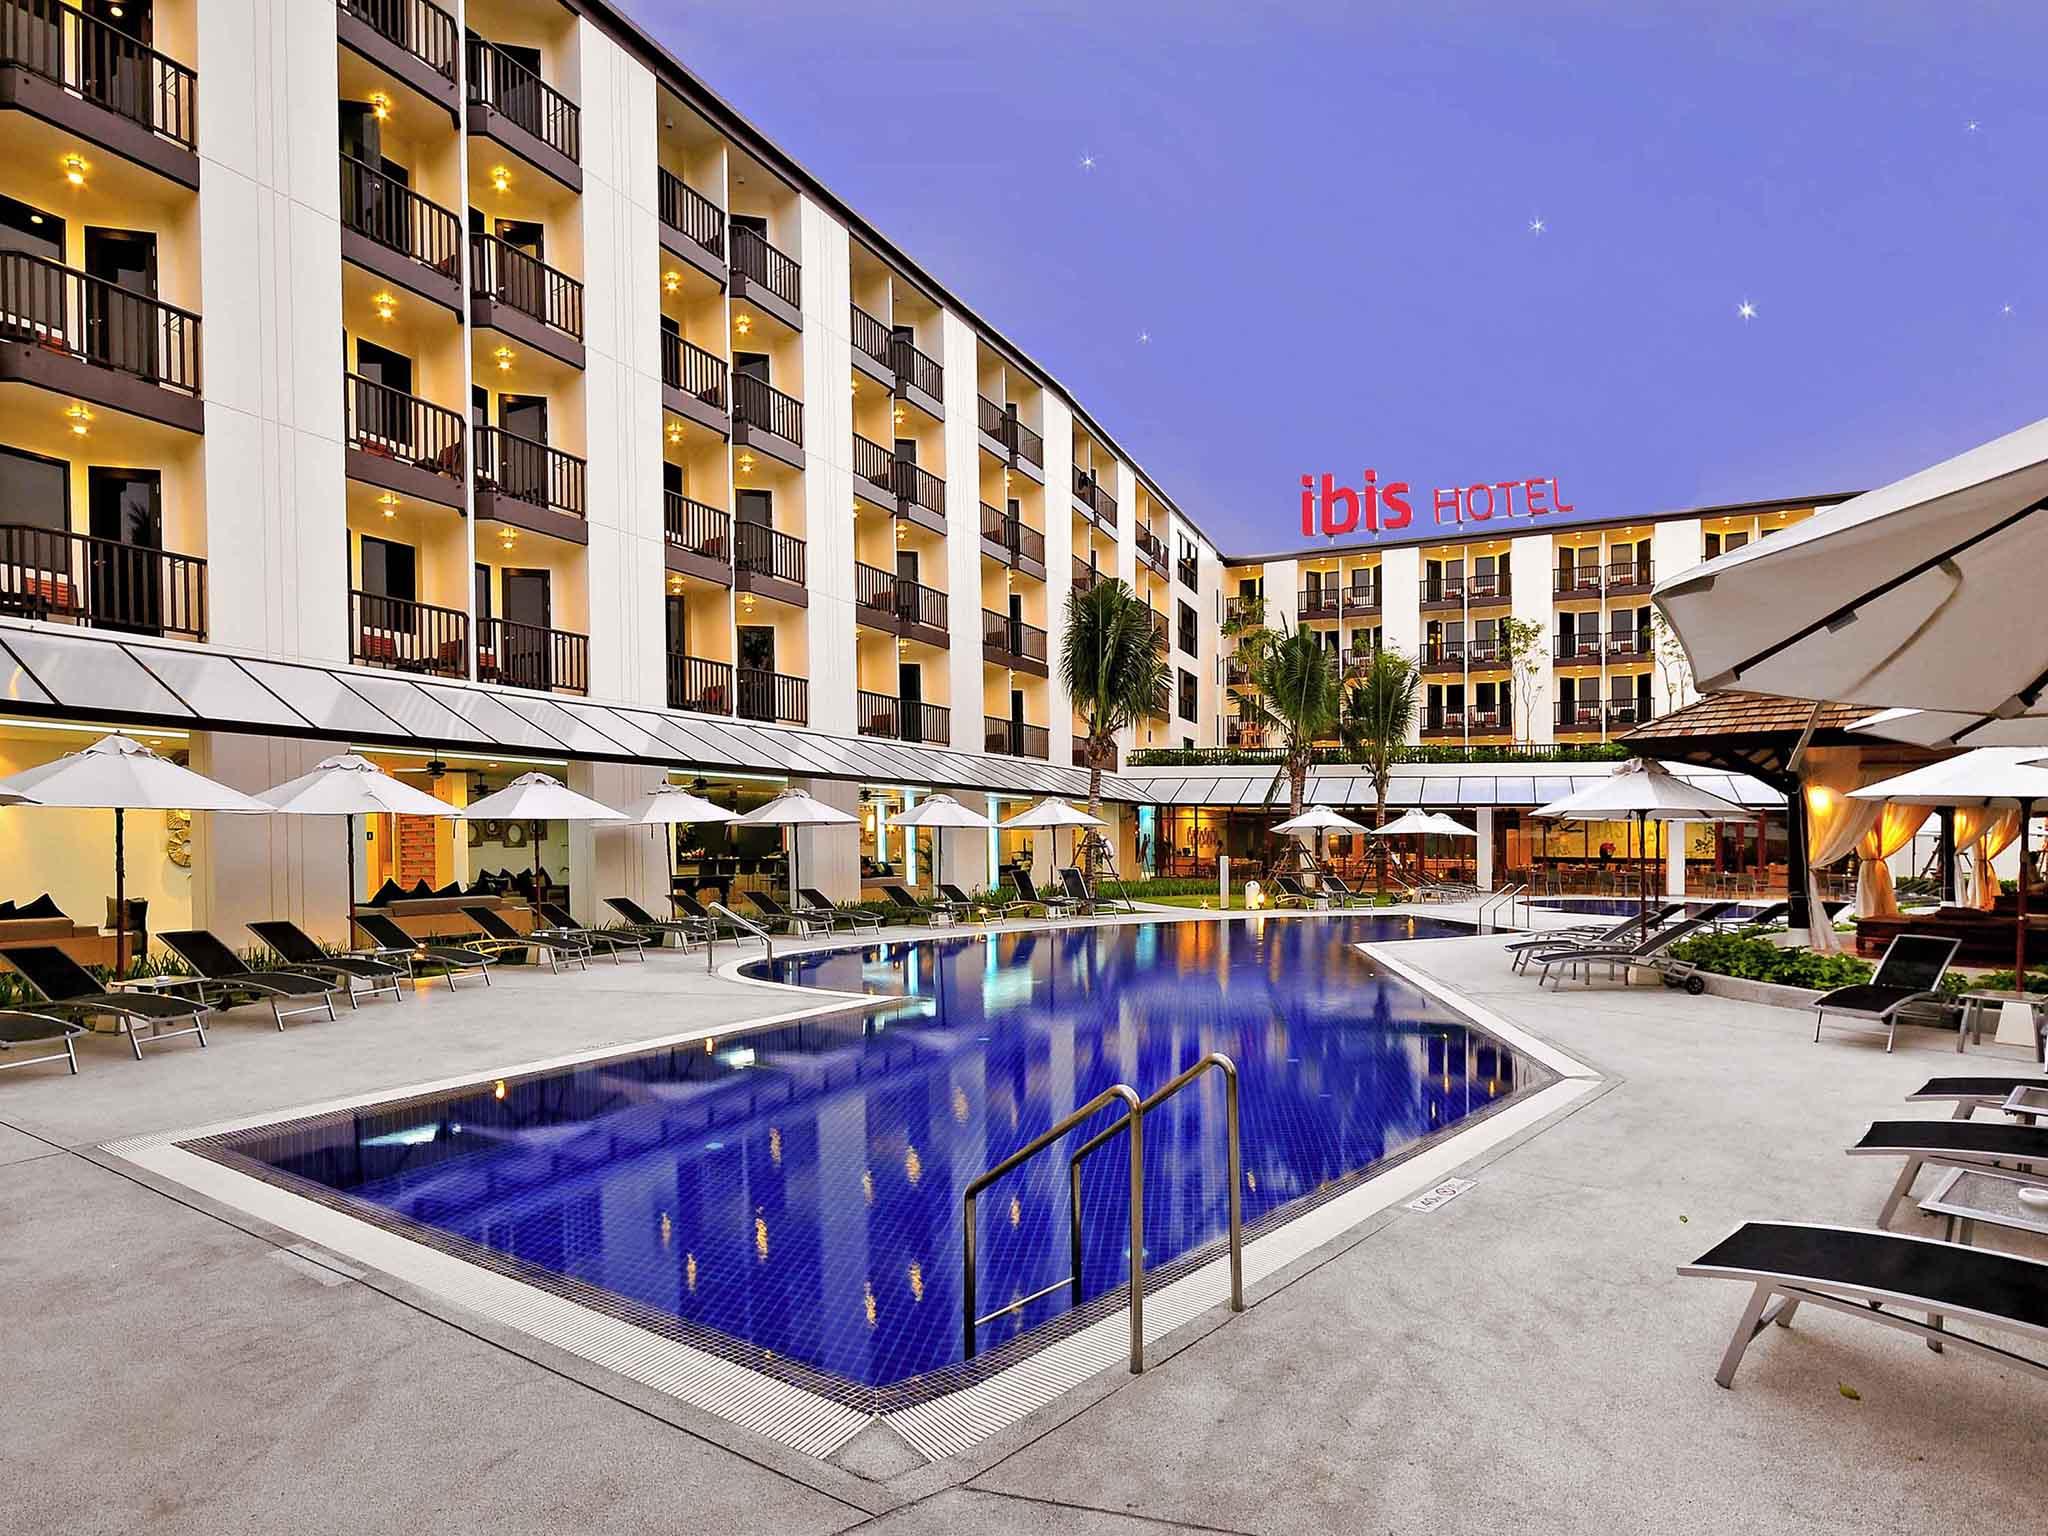 hotel in phuket ibis phuket kata. Black Bedroom Furniture Sets. Home Design Ideas